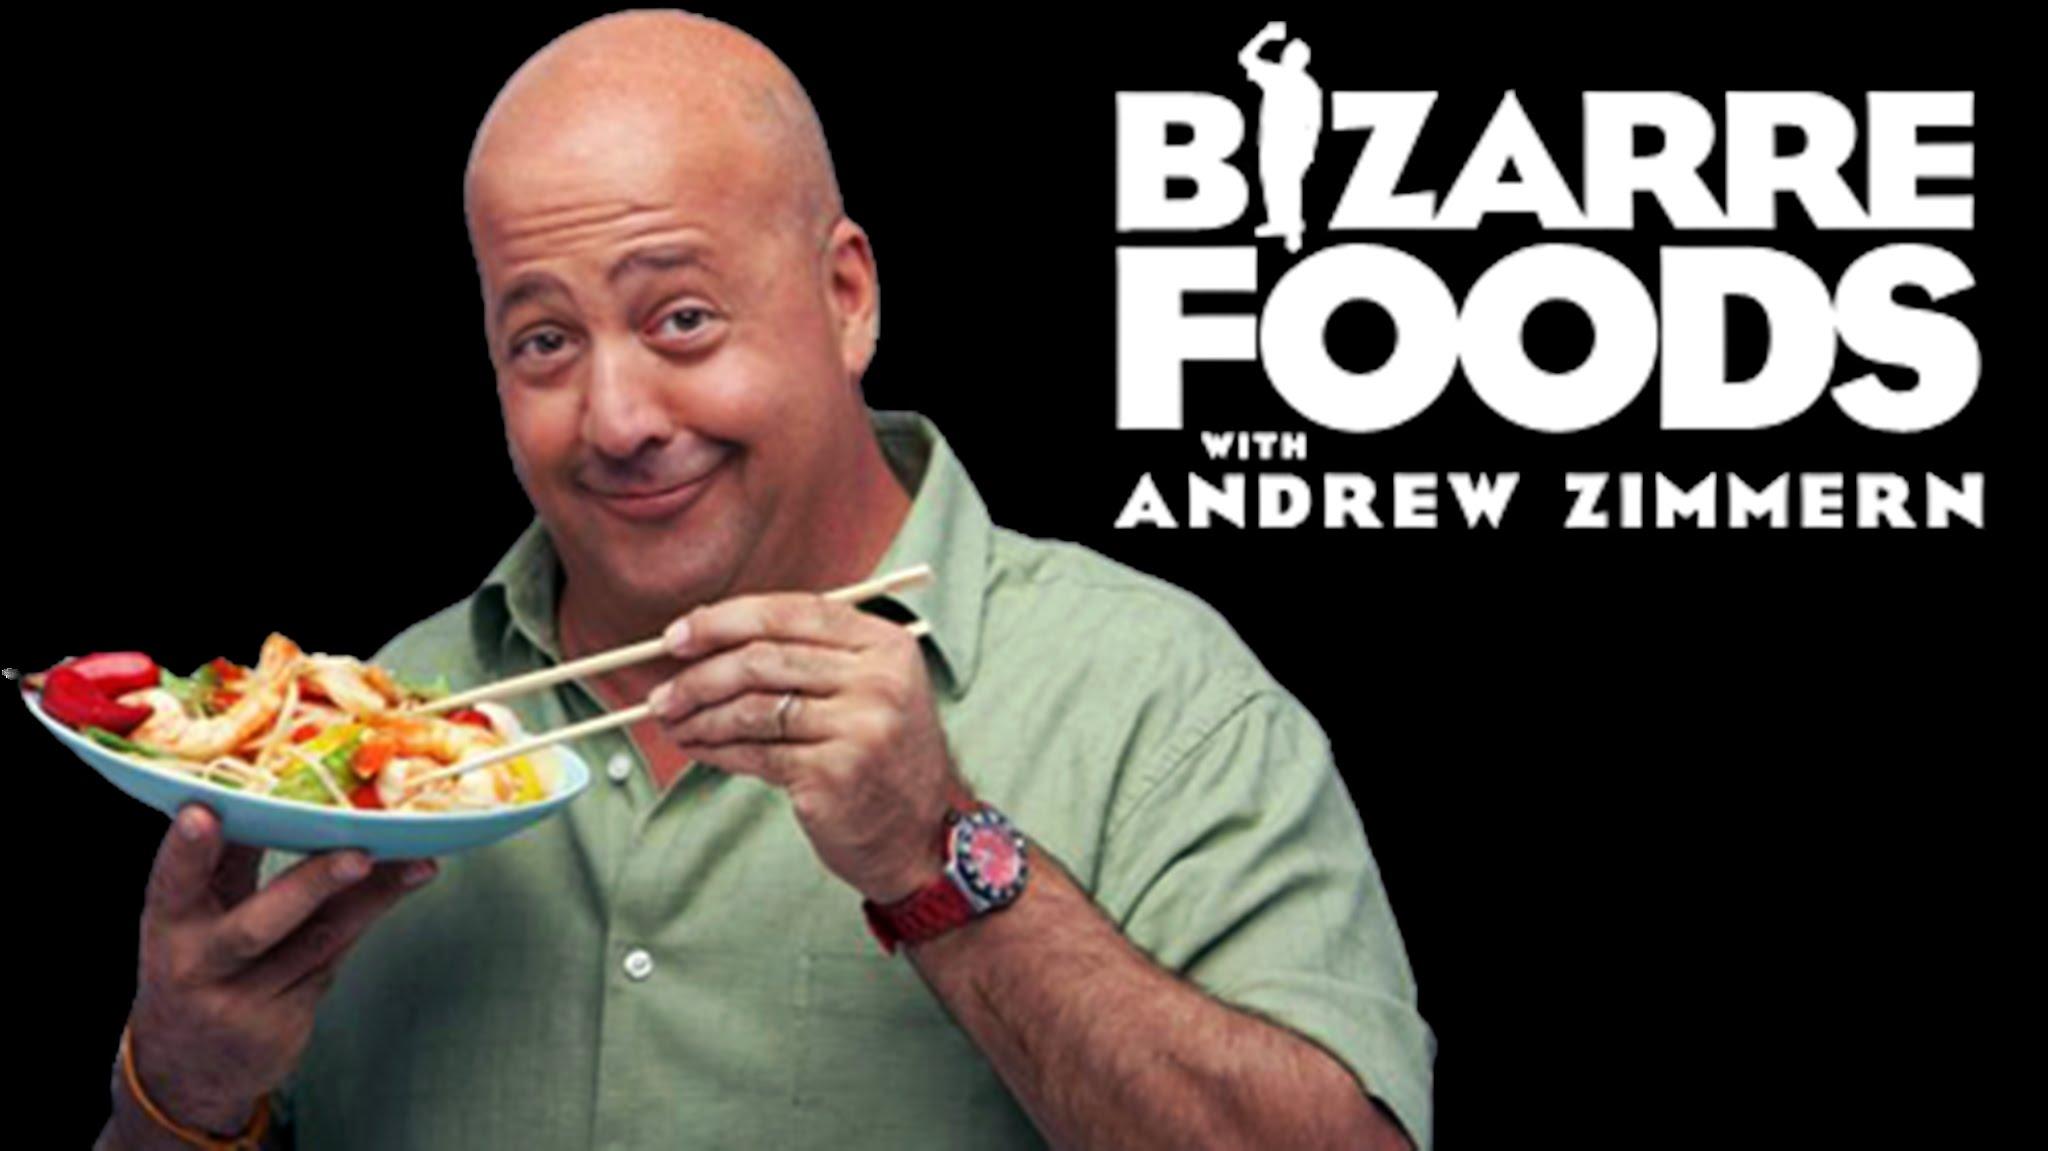 Bizarre Foods With Andrew Zimmern: Season 16